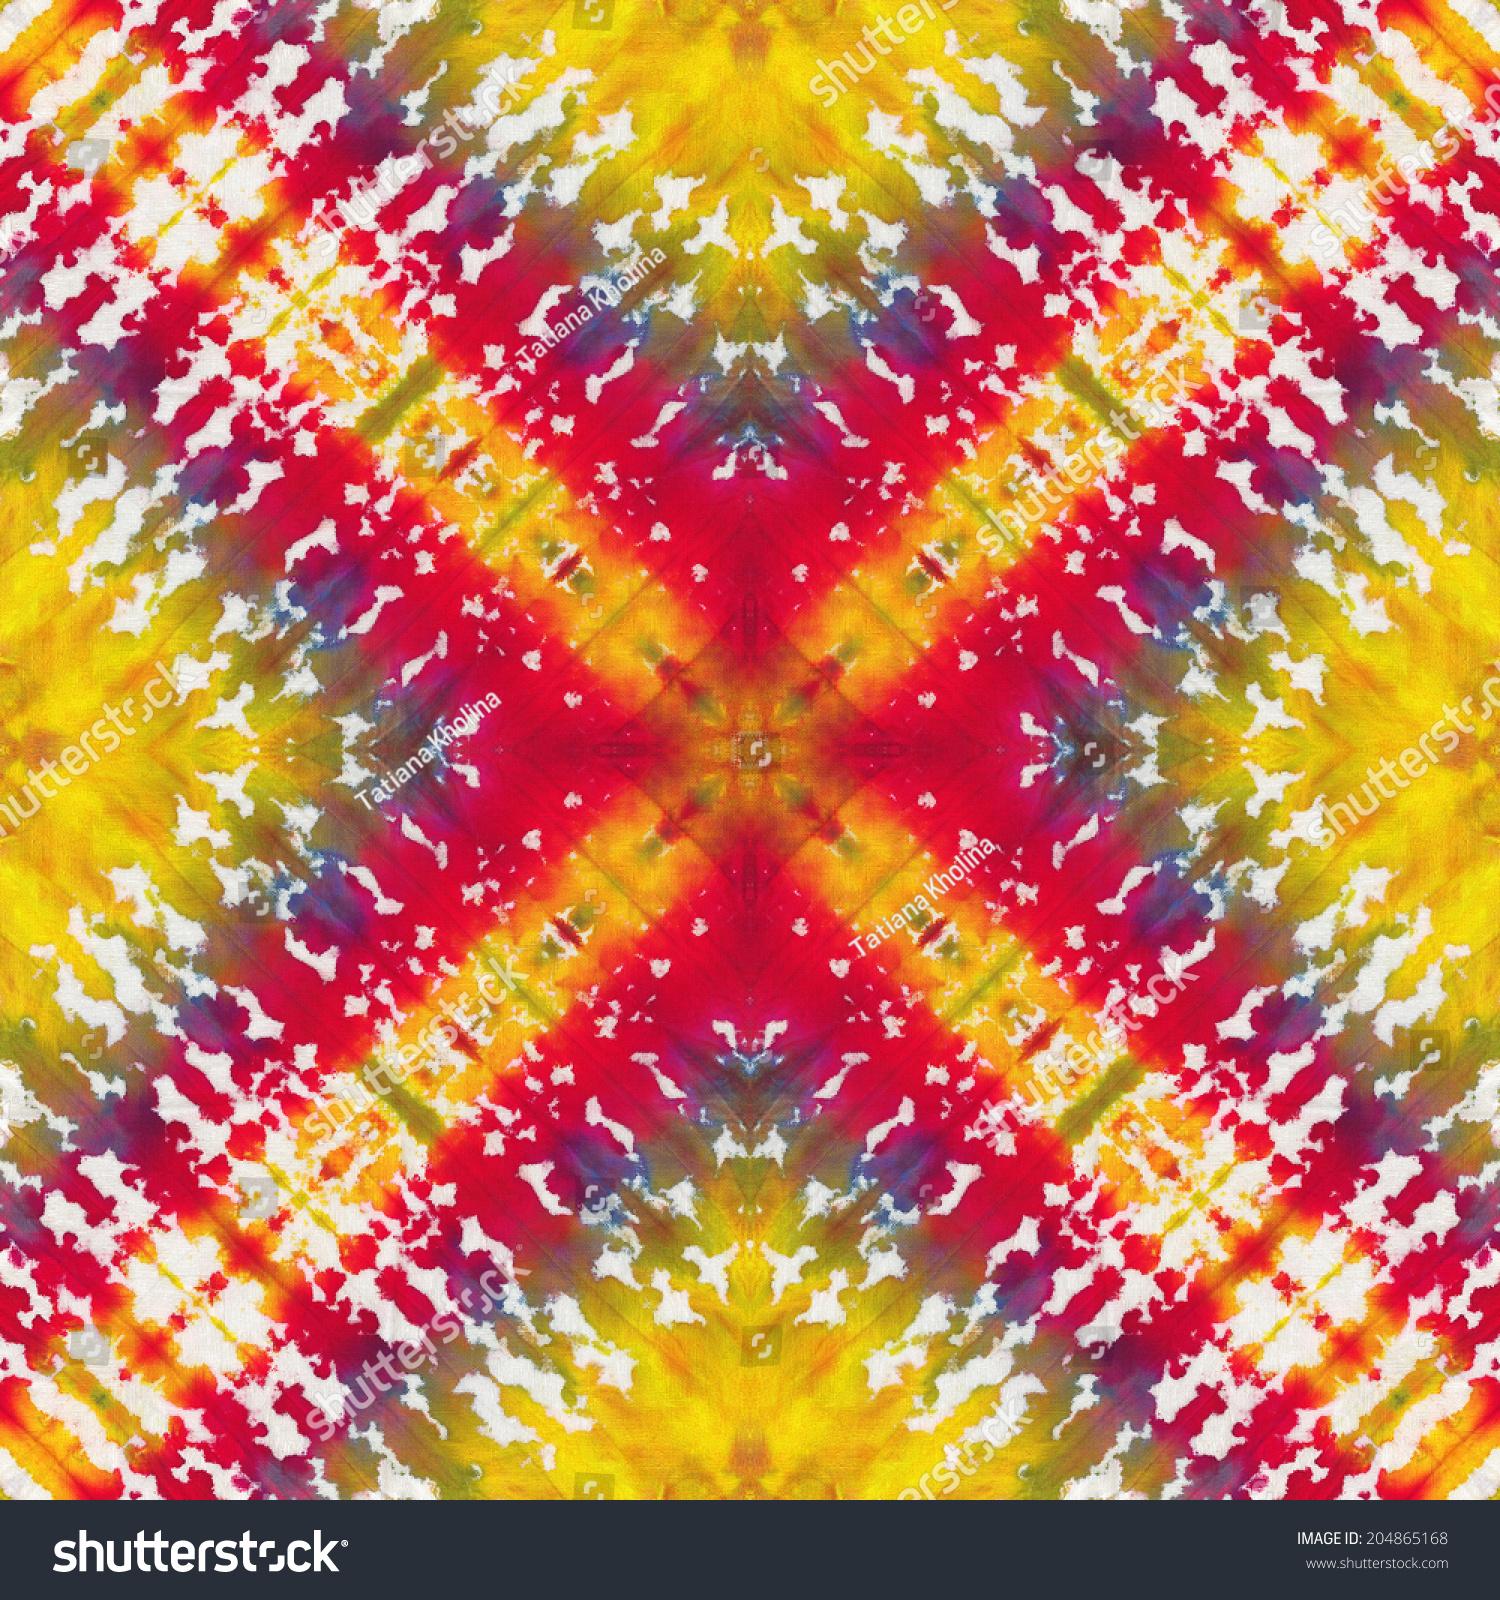 seamless repeating tie dye - photo #22